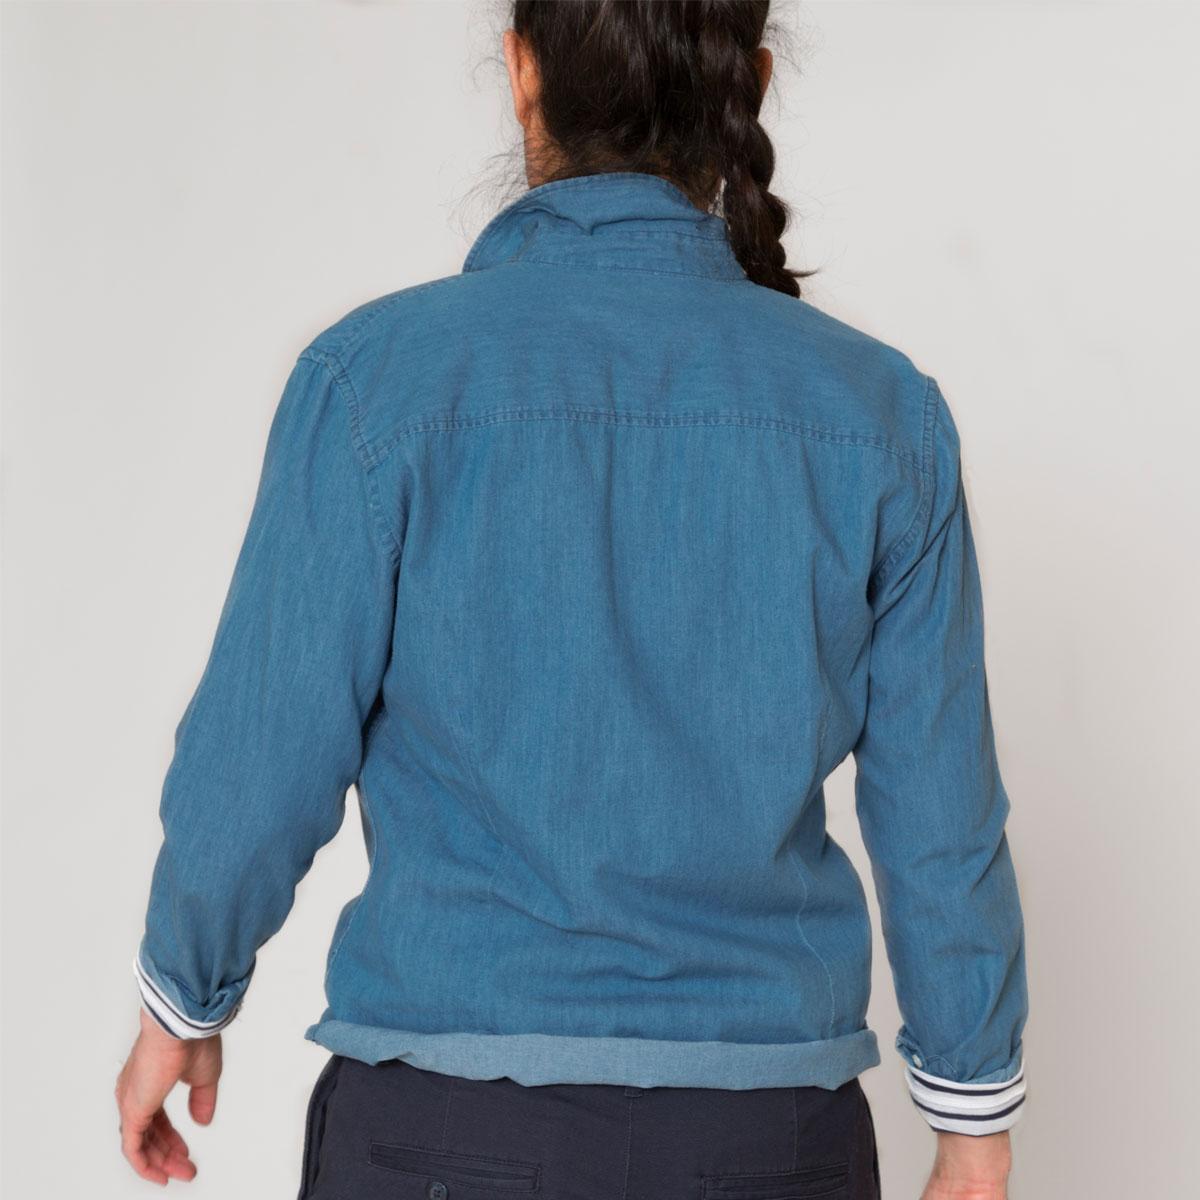 Chemise en jean coton bio Bretagne indigo dos